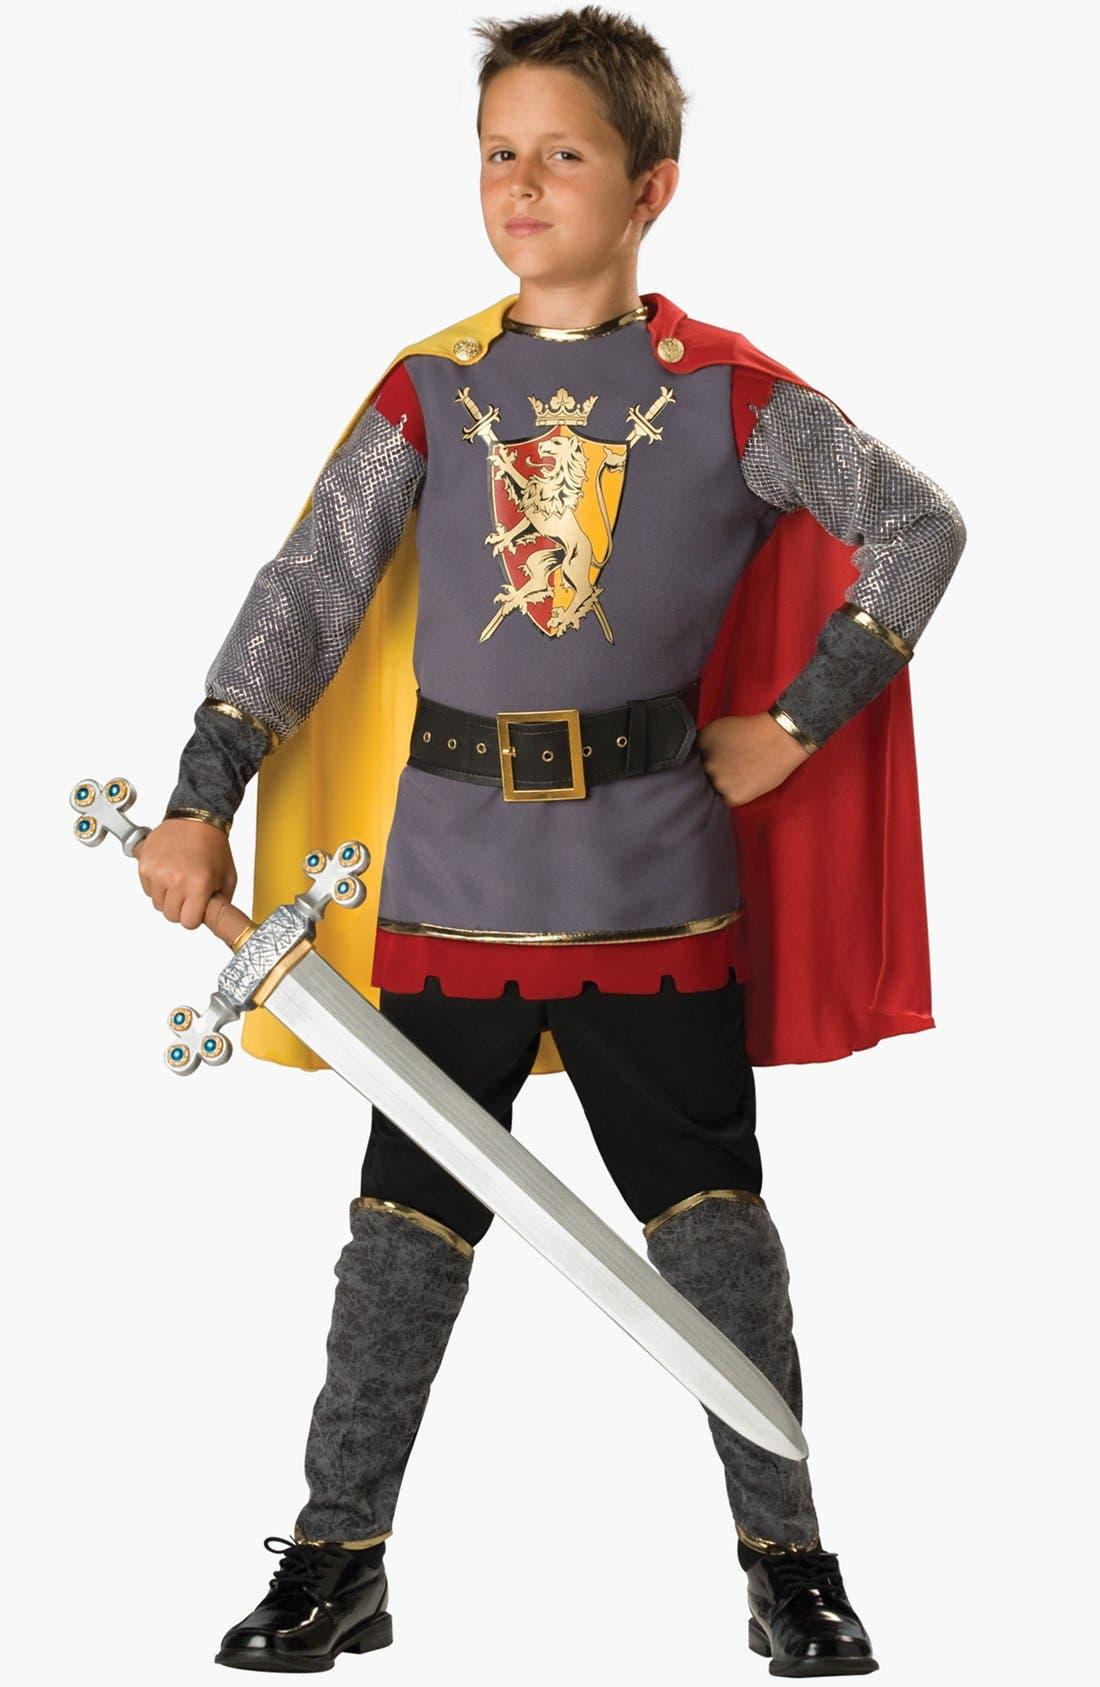 Alternate Image 1 Selected - InCharacter Costumes 'Loyal Knight' Tunic, Cape & Pants (Little Boys & Big Boys)